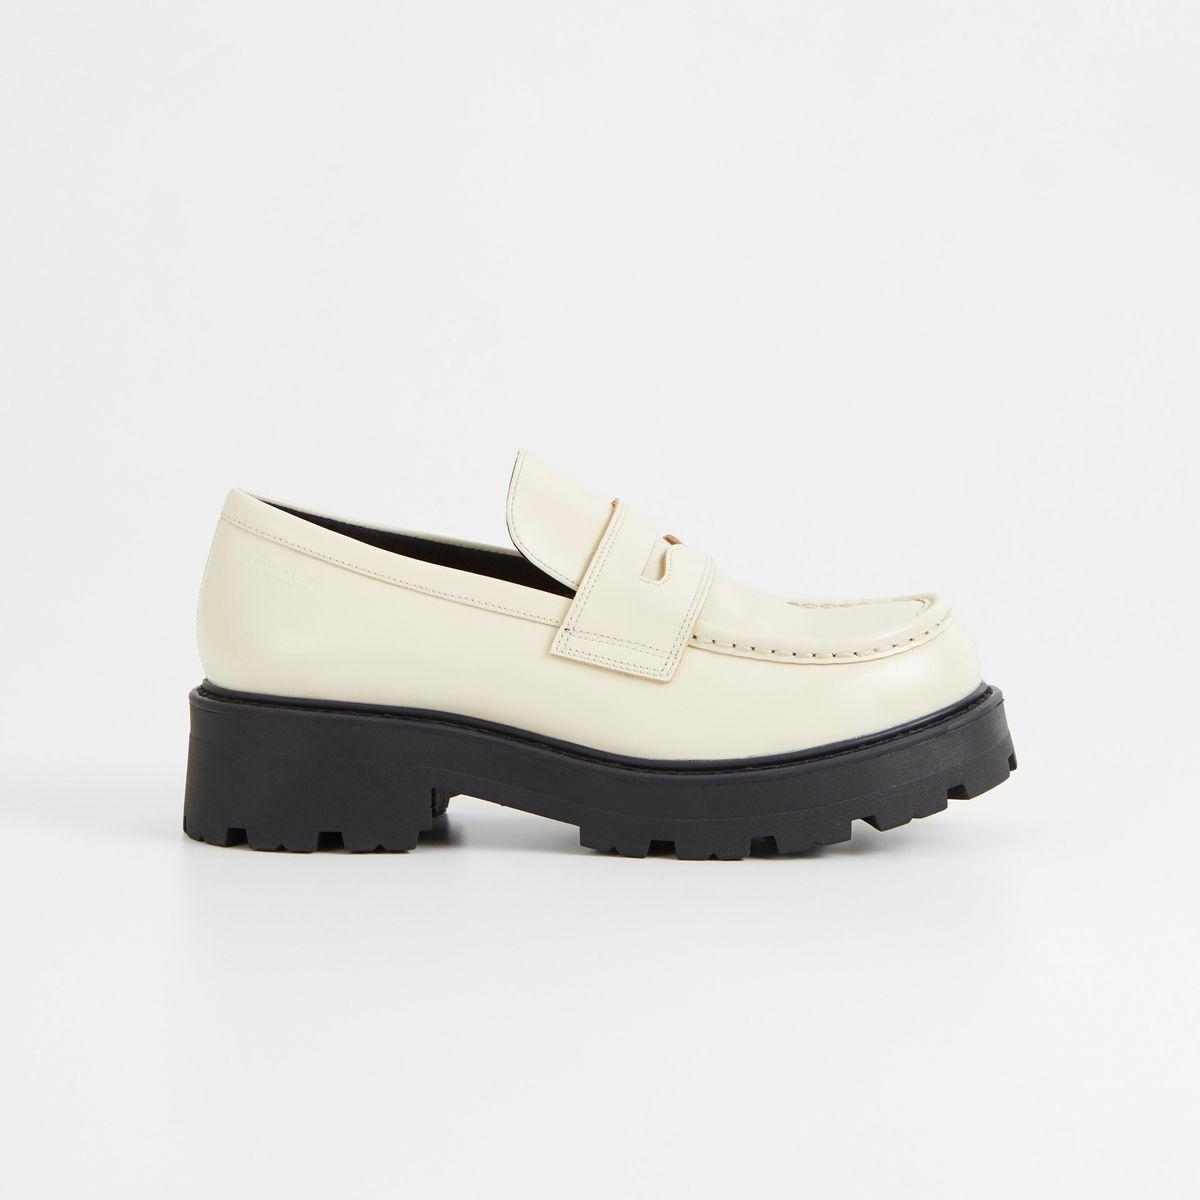 vagabond cosmo 2.0 loafer